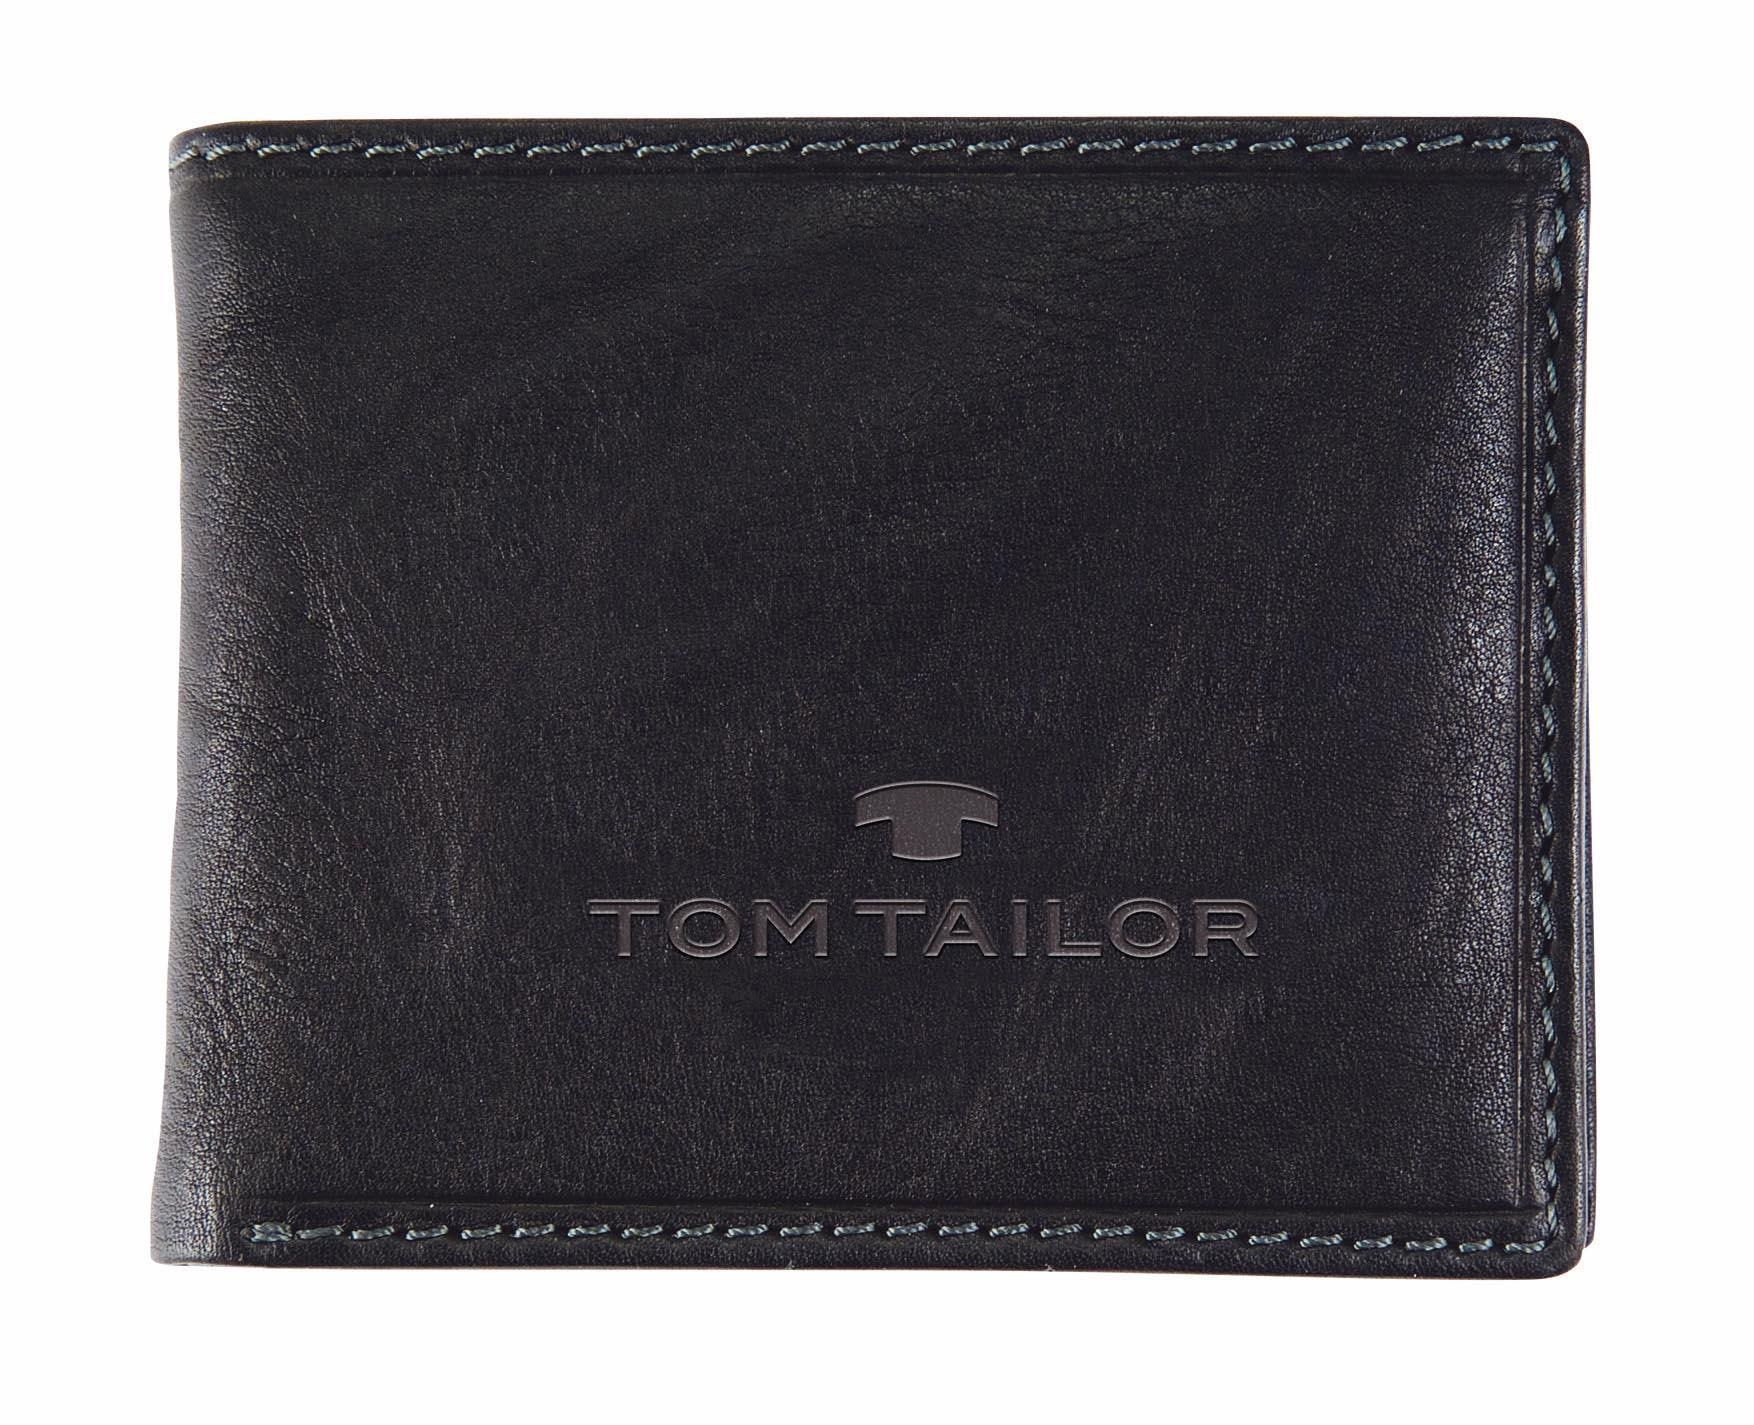 TOM TAILOR Geldbörse LARY   Accessoires   Tom Tailor